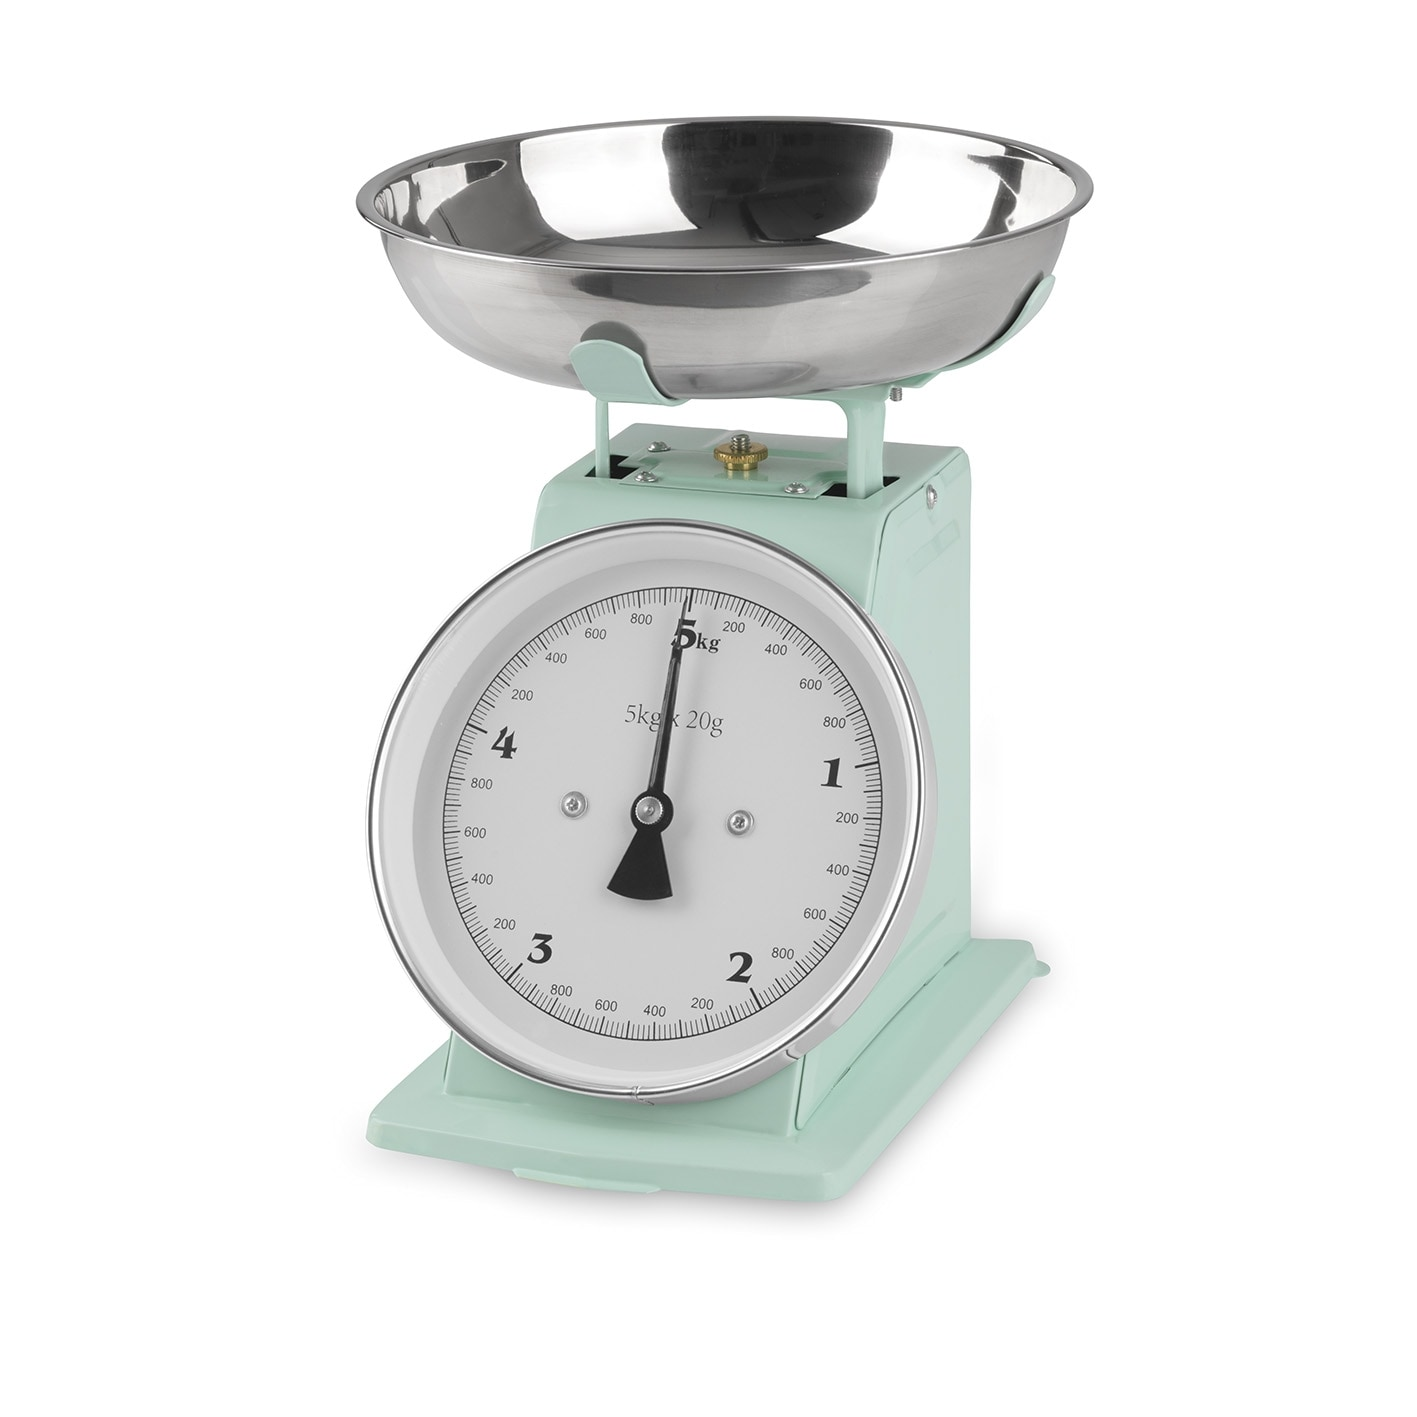 GOURMETmaxx Küchenwaage Retro in Mint